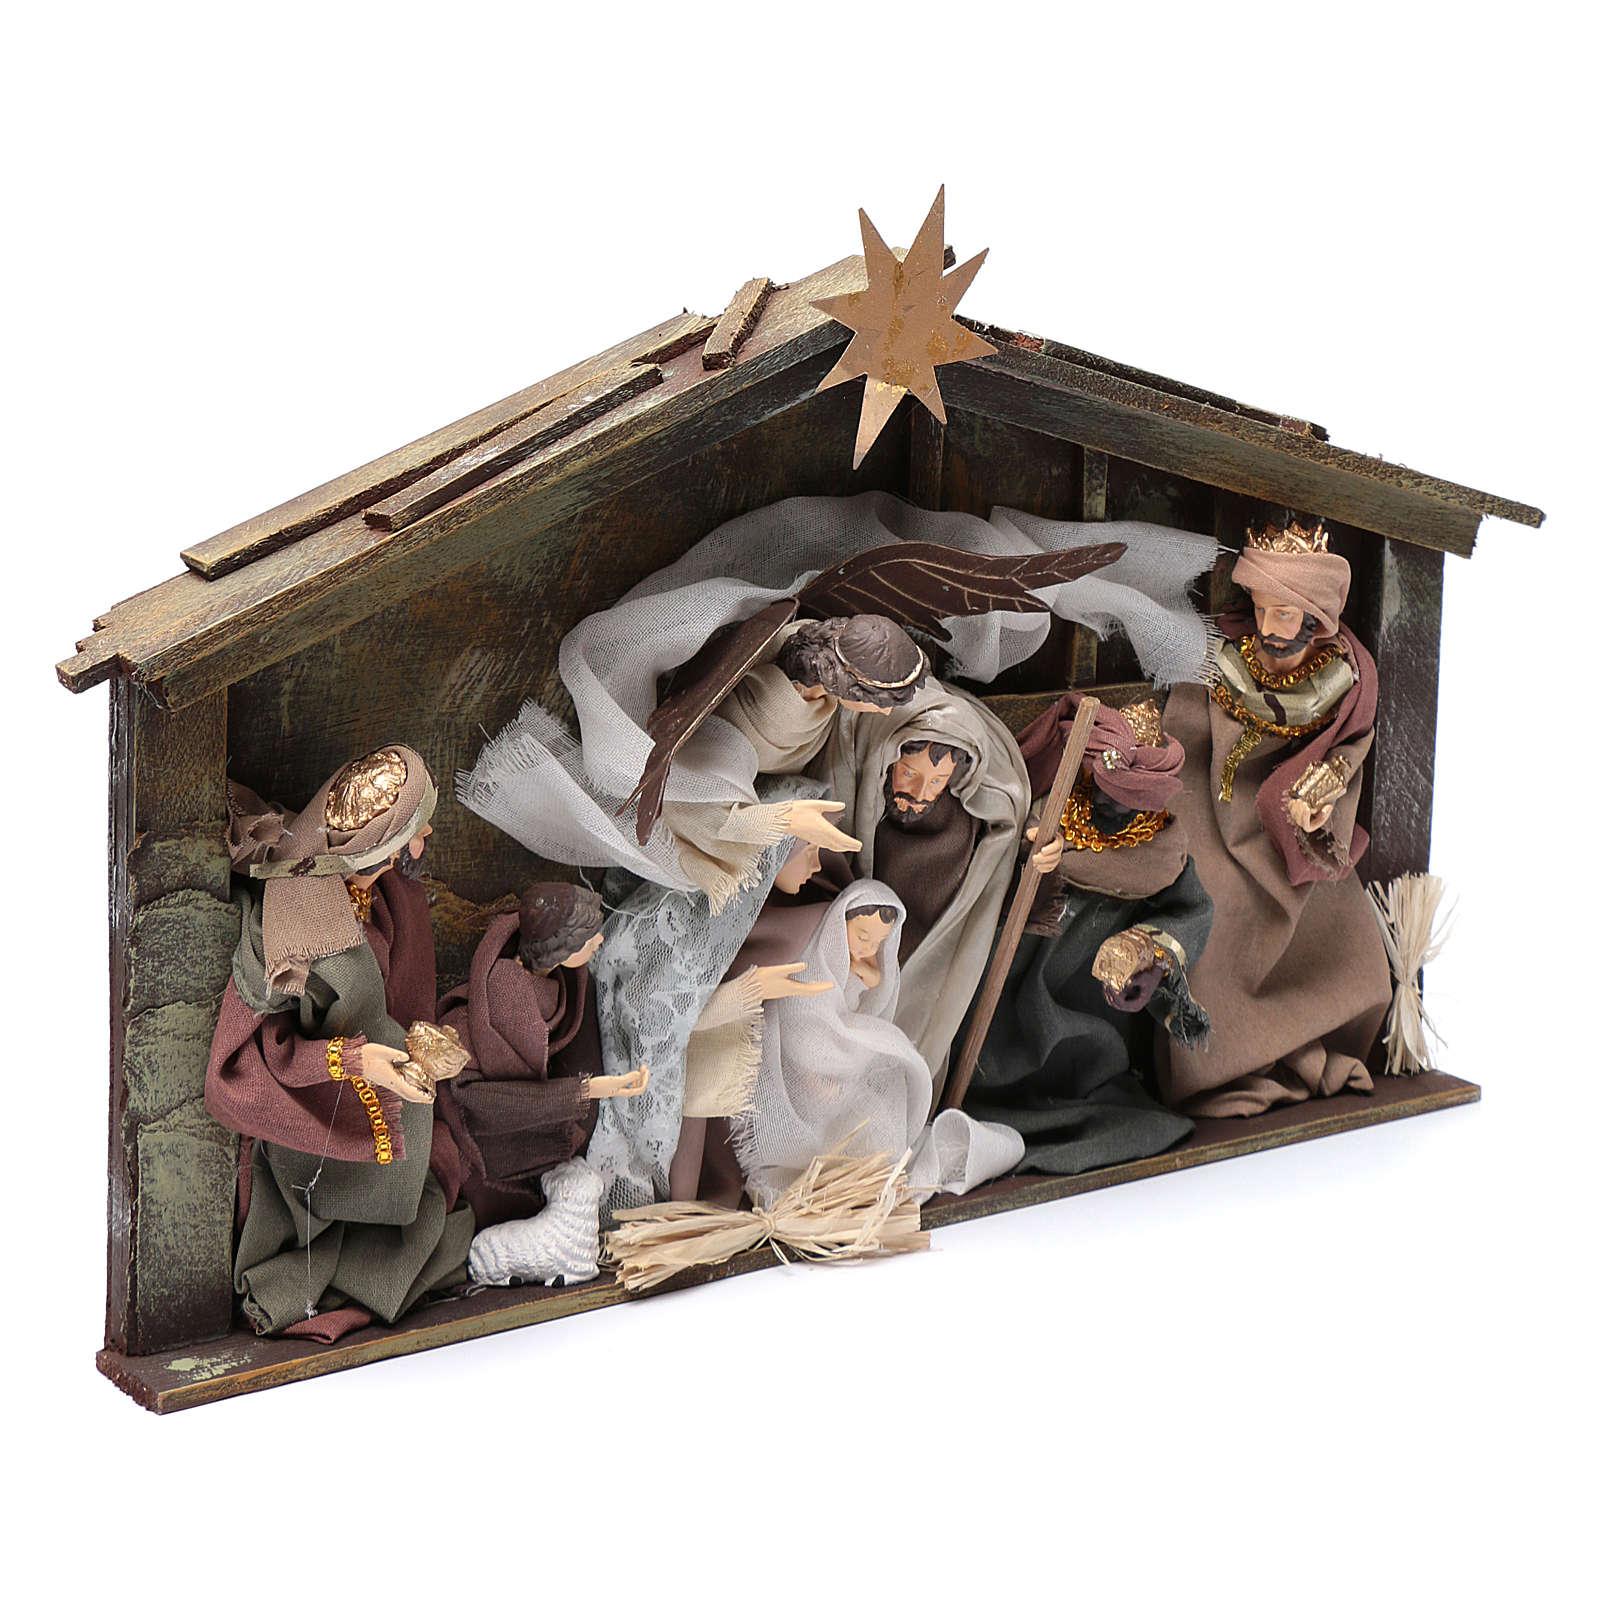 Escena belén en cabaña marco 35 cm personajes resina 4